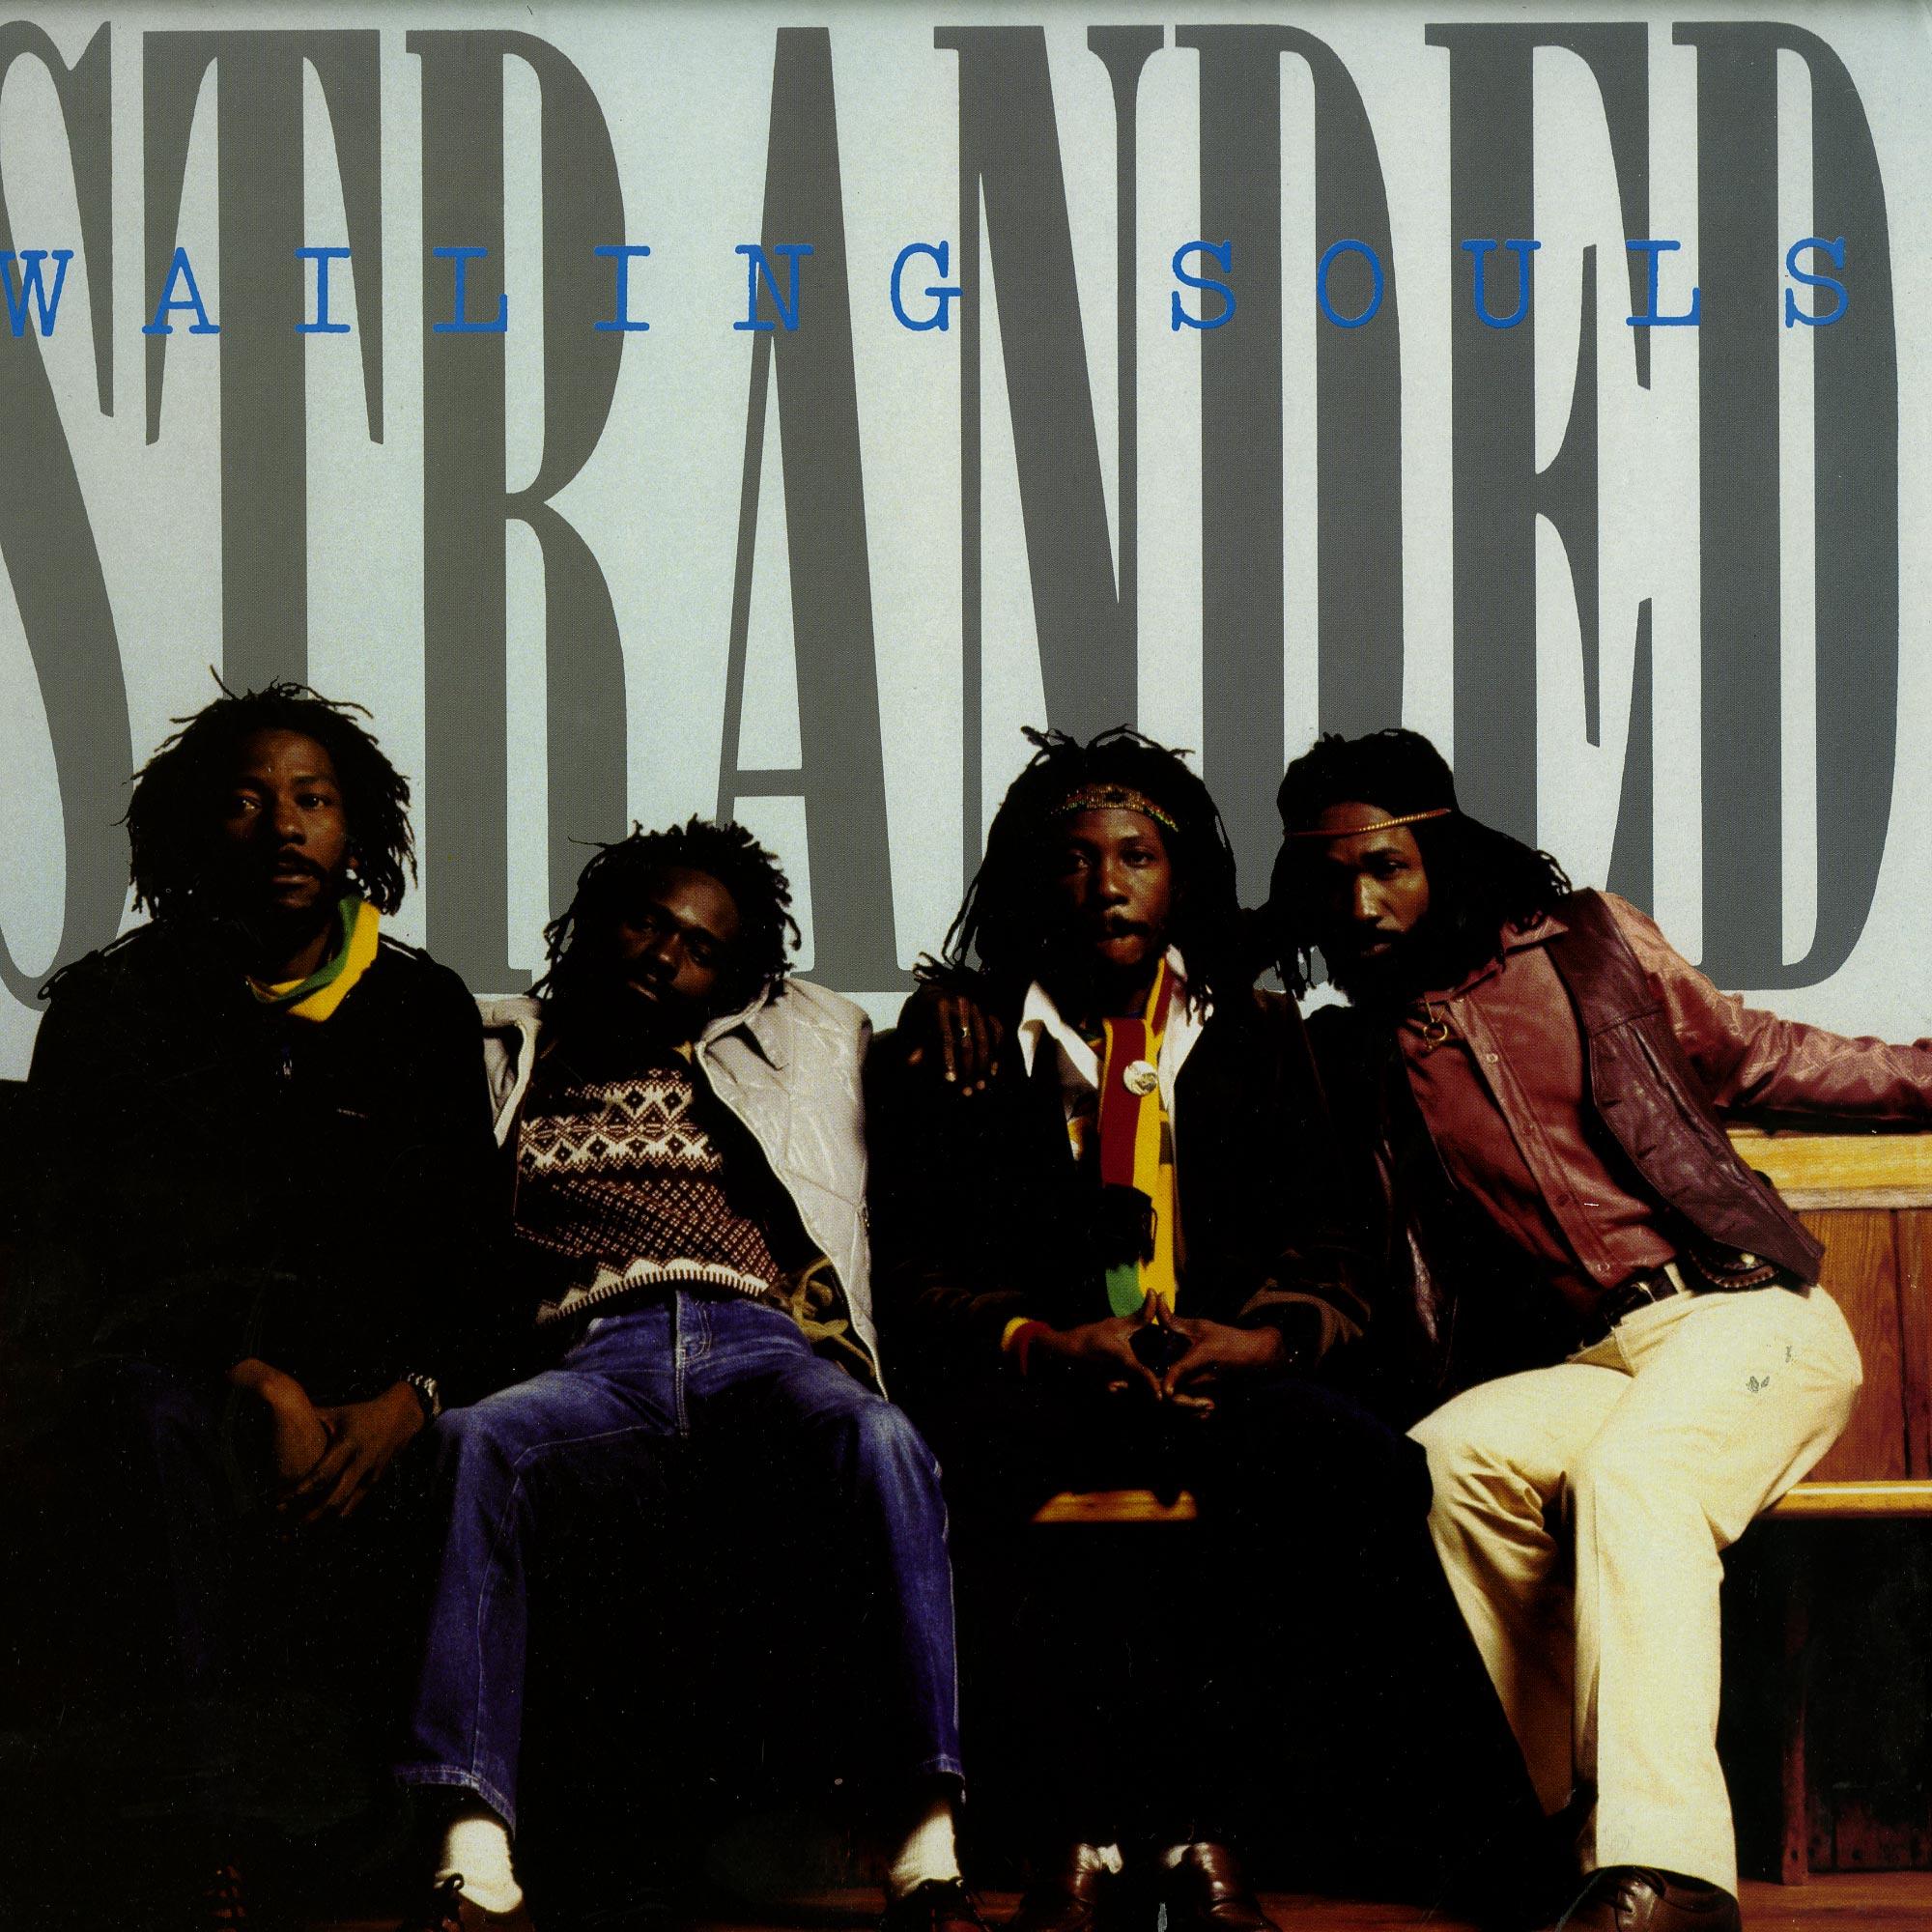 Wailing Souls - STRANDED